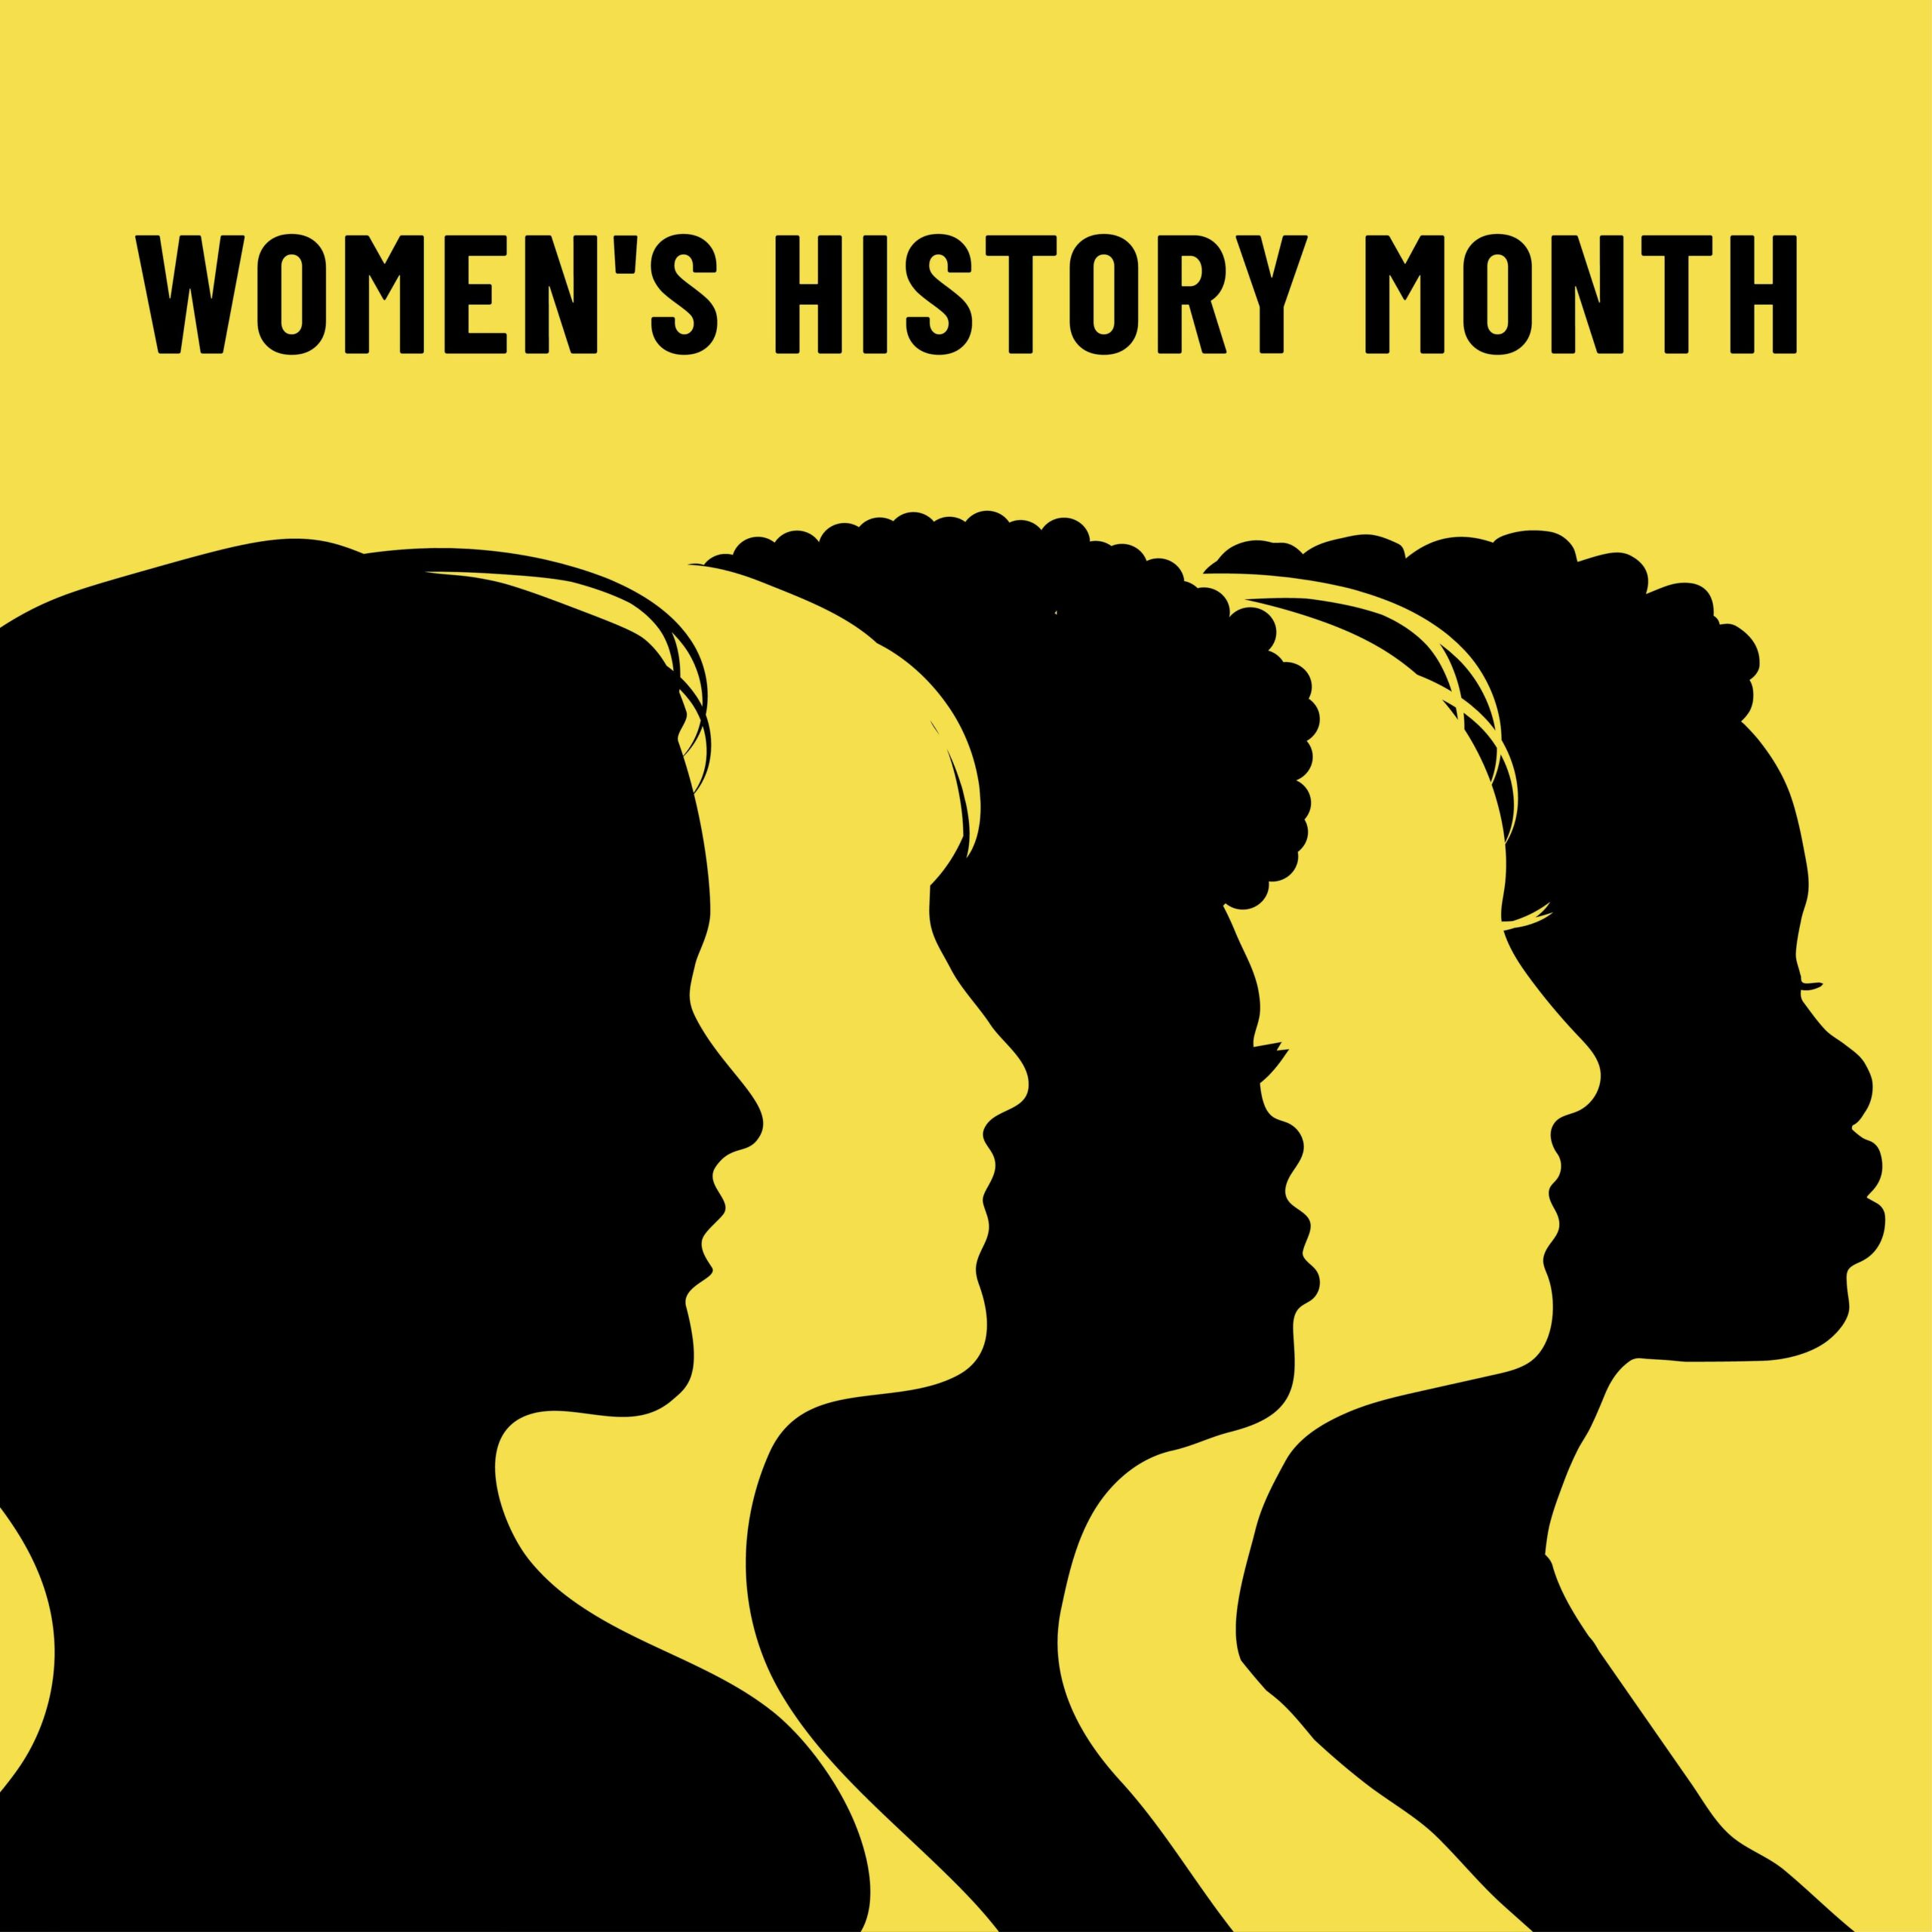 #Women's History Month